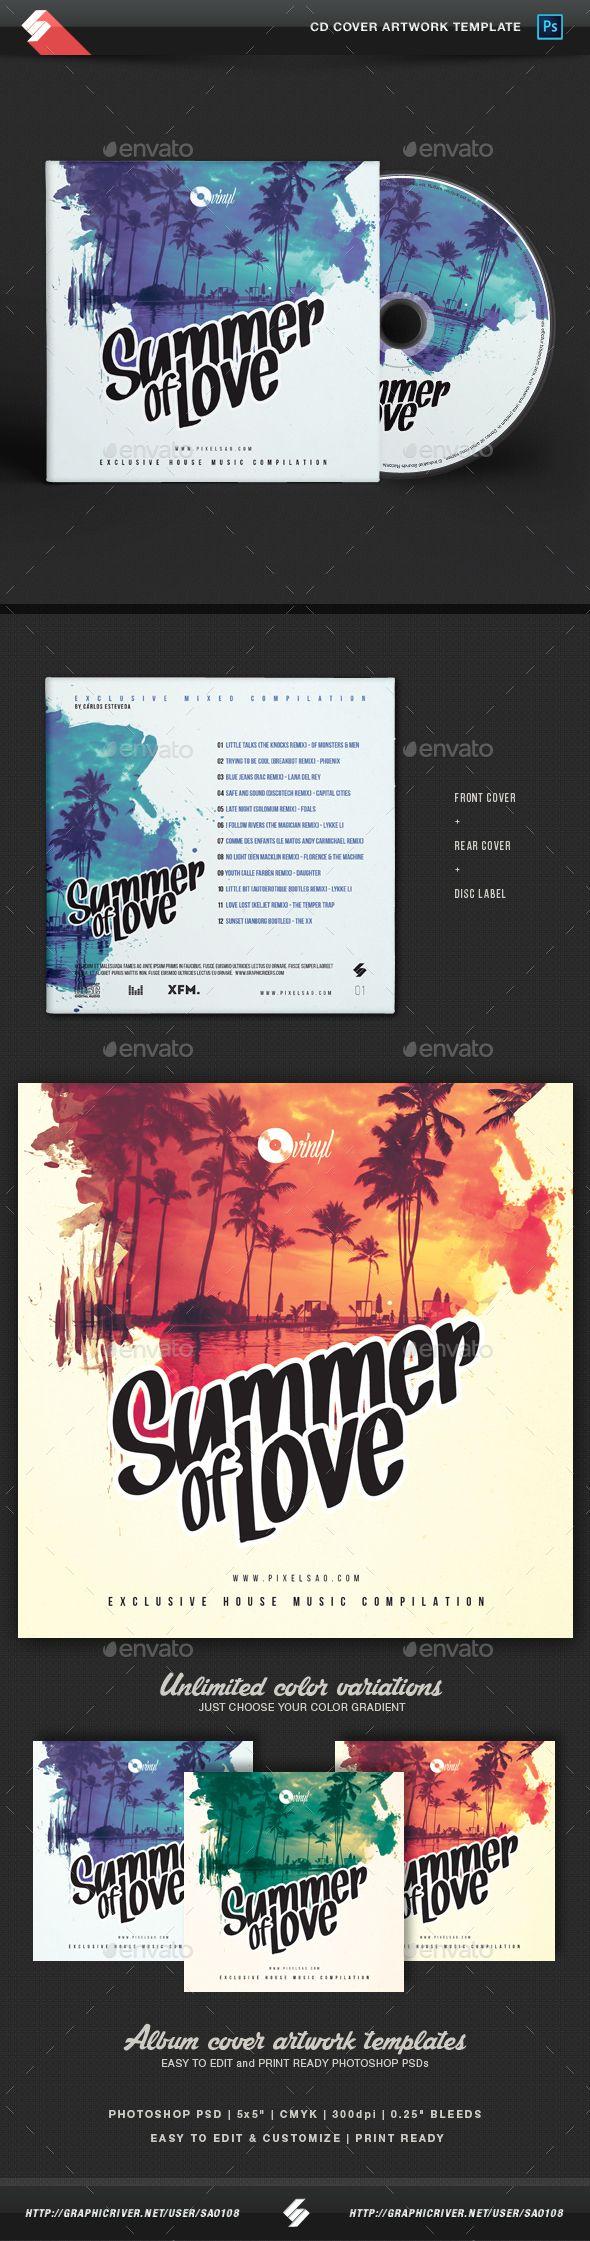 Summer Of Love  Cd Cover Artwork Template